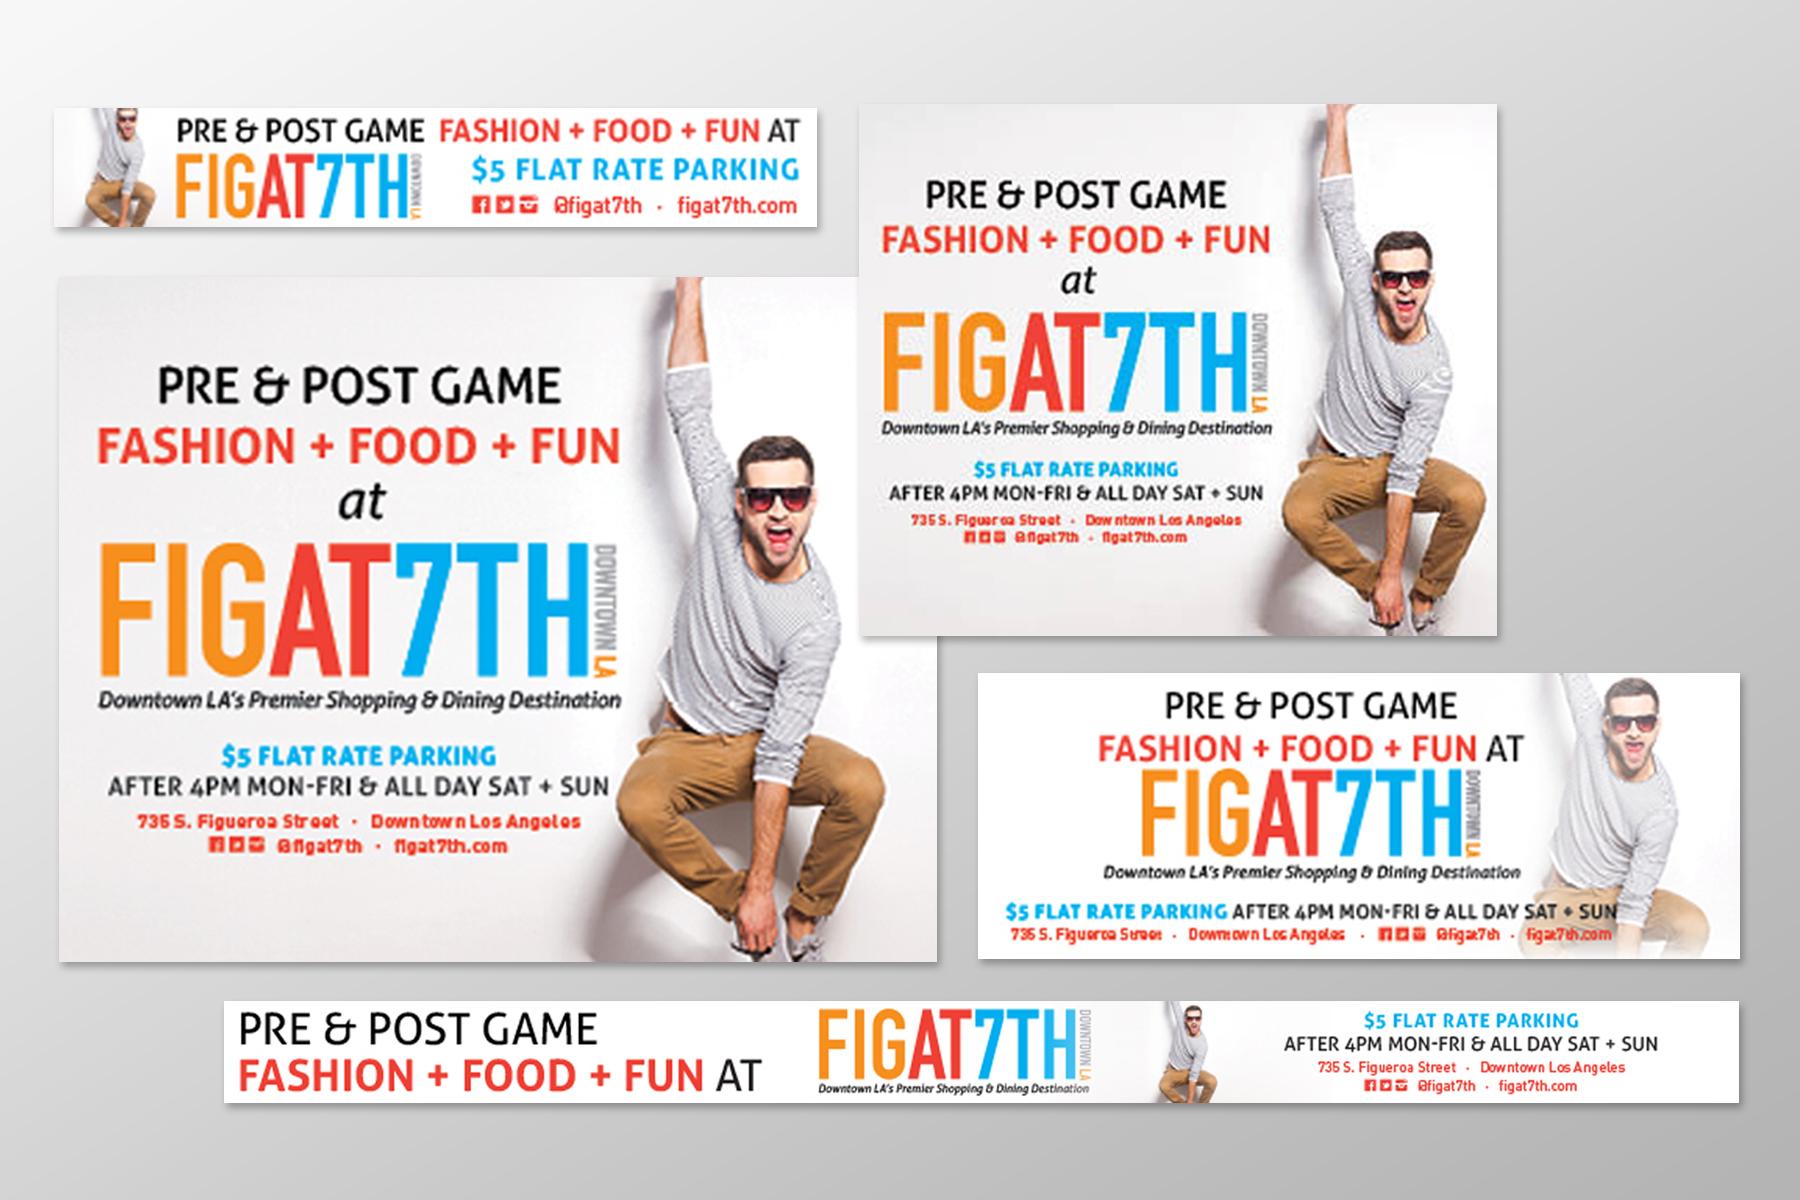 FigAt7th-ESPN Ads_web1.jpg